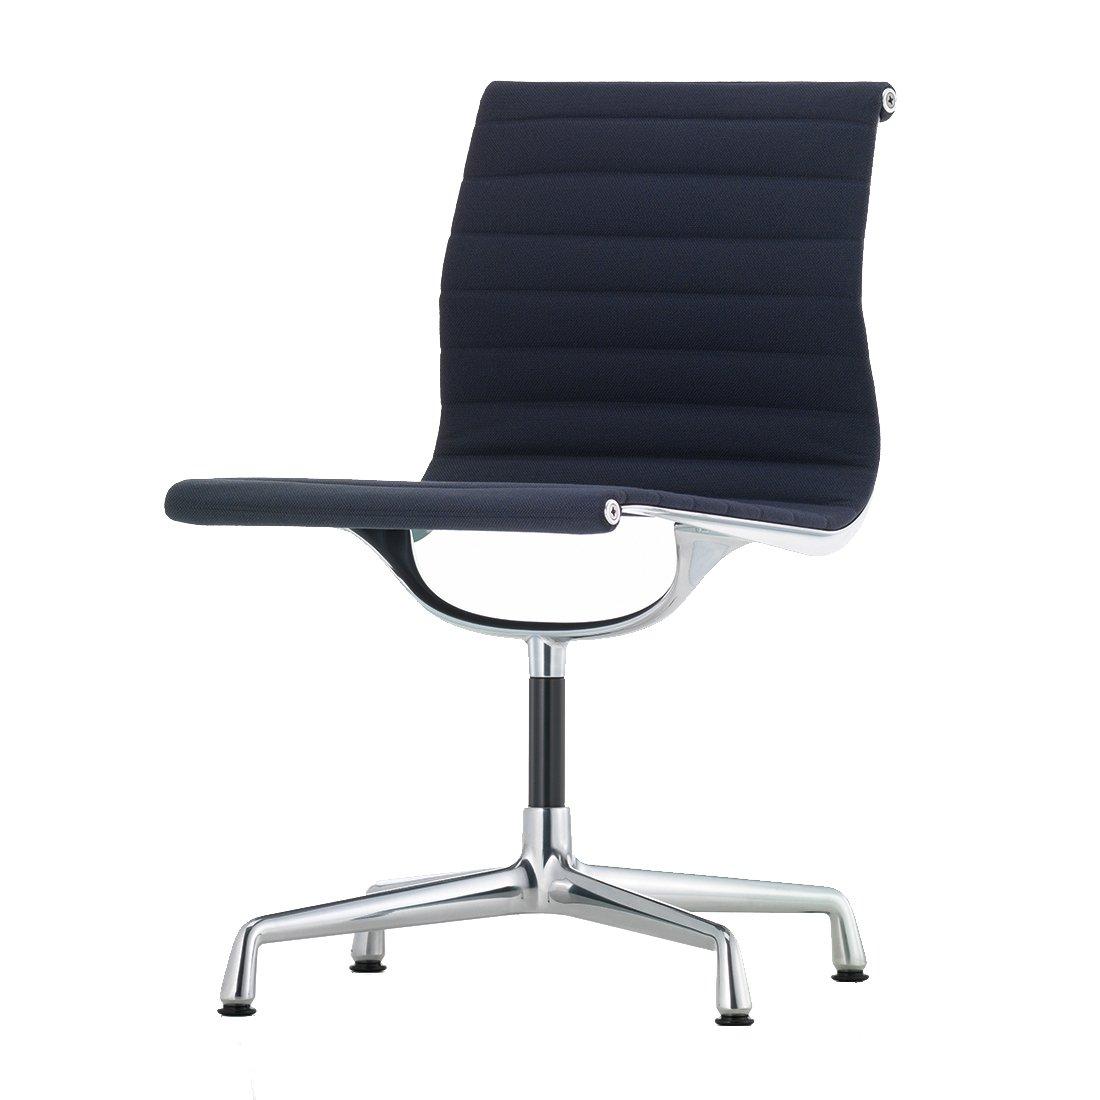 Vitra Aluminium Chair EA 101 - Hopsak Donkerblauw/Veenbruin